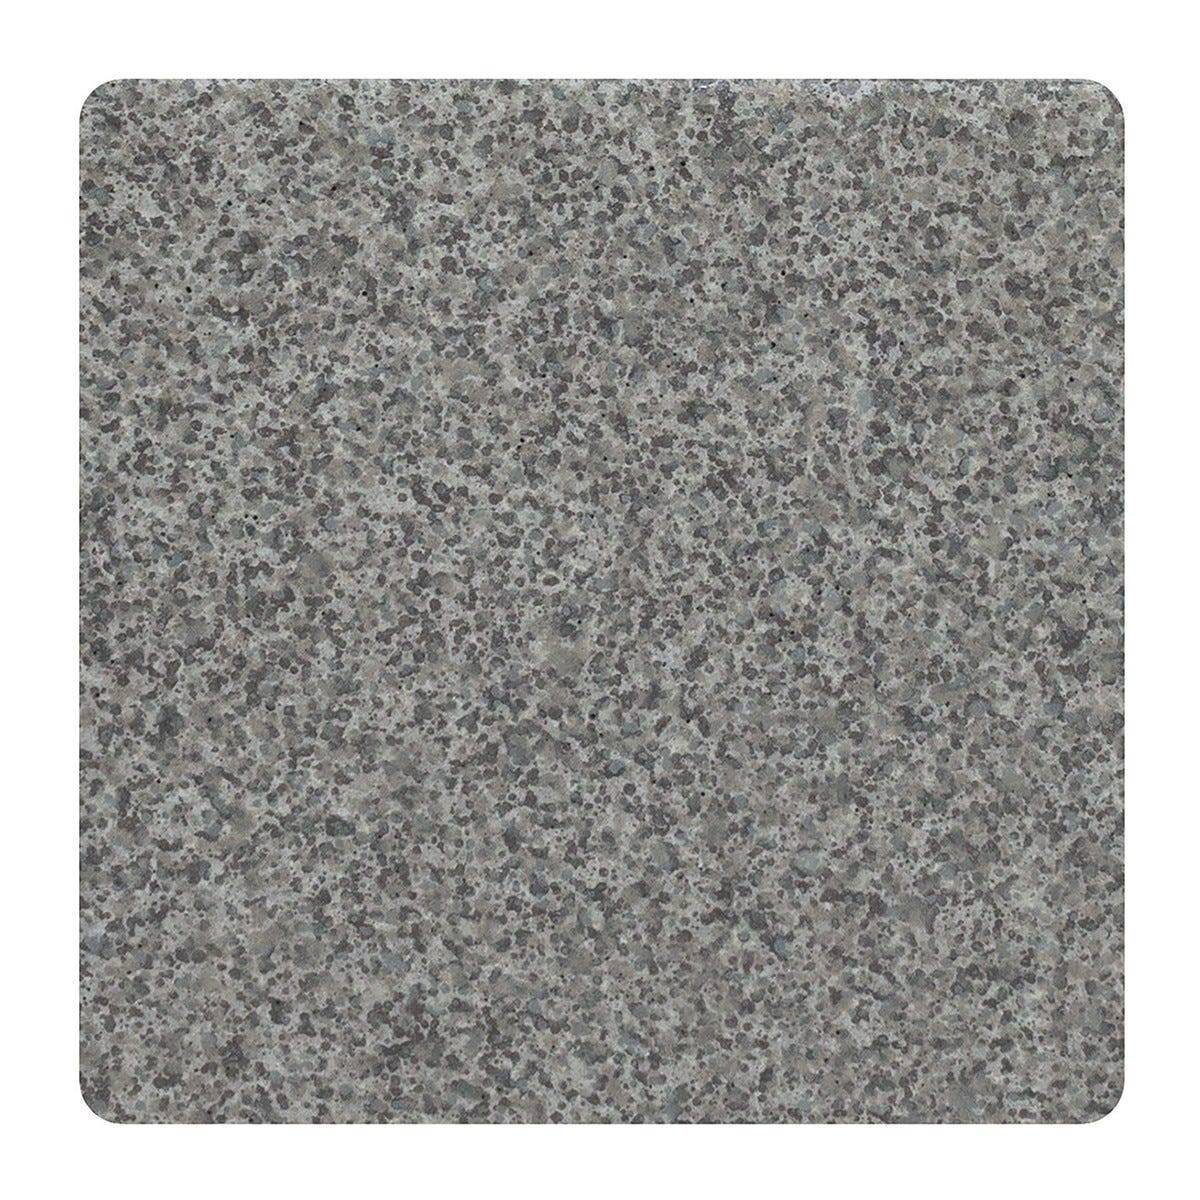 Pavimento Esterno Porfido Perla 15,2x15,2x0,85 Cm Pei 5 R10 Gres Porcellanato